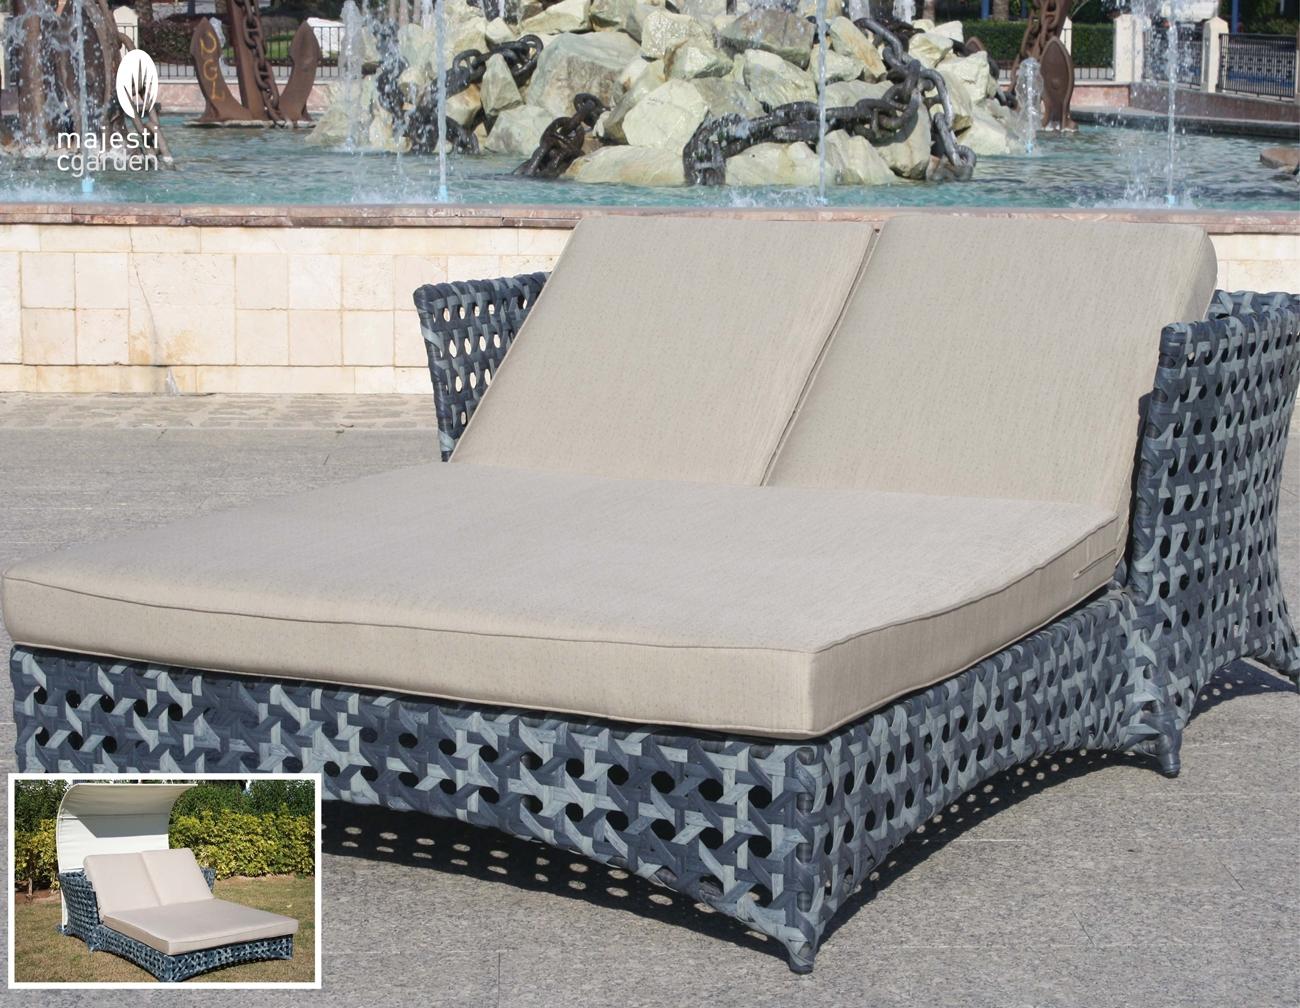 Tumbona para exterior modelo SAILING - Tumbona para exterior modelo SAILING de Majestic Garden